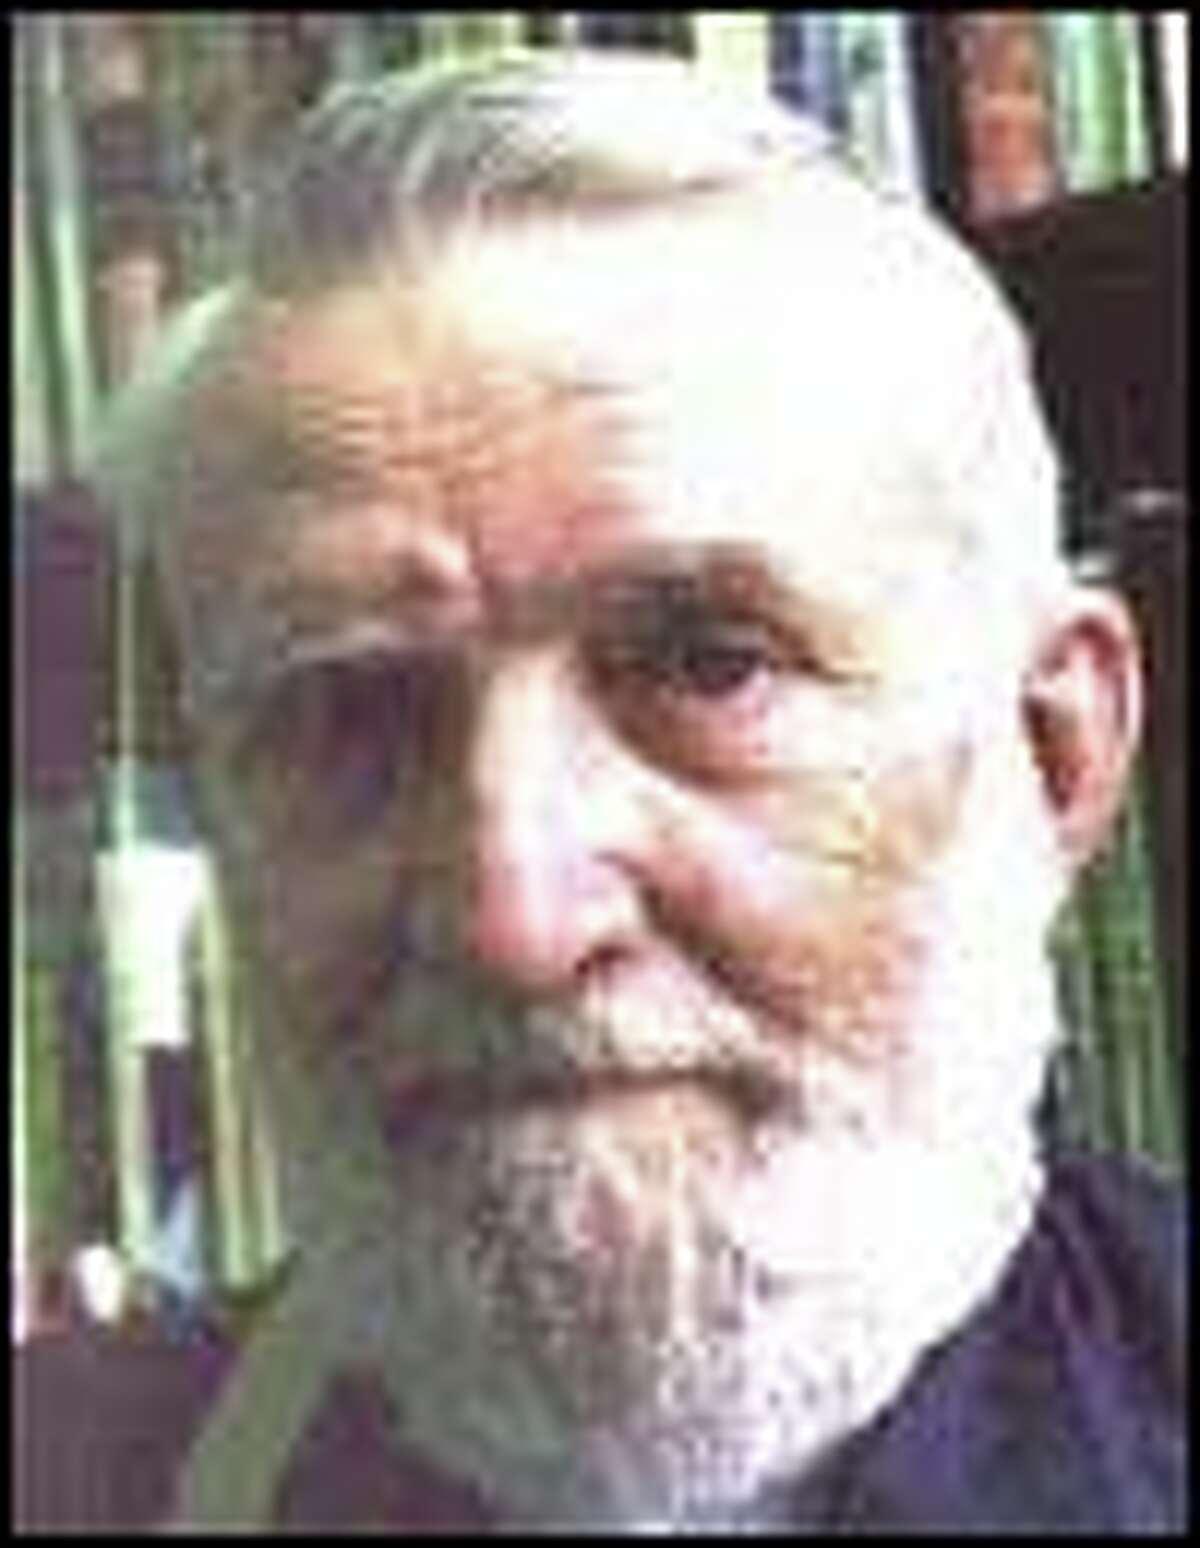 Dr. Grover Krantz, authority on human evolution